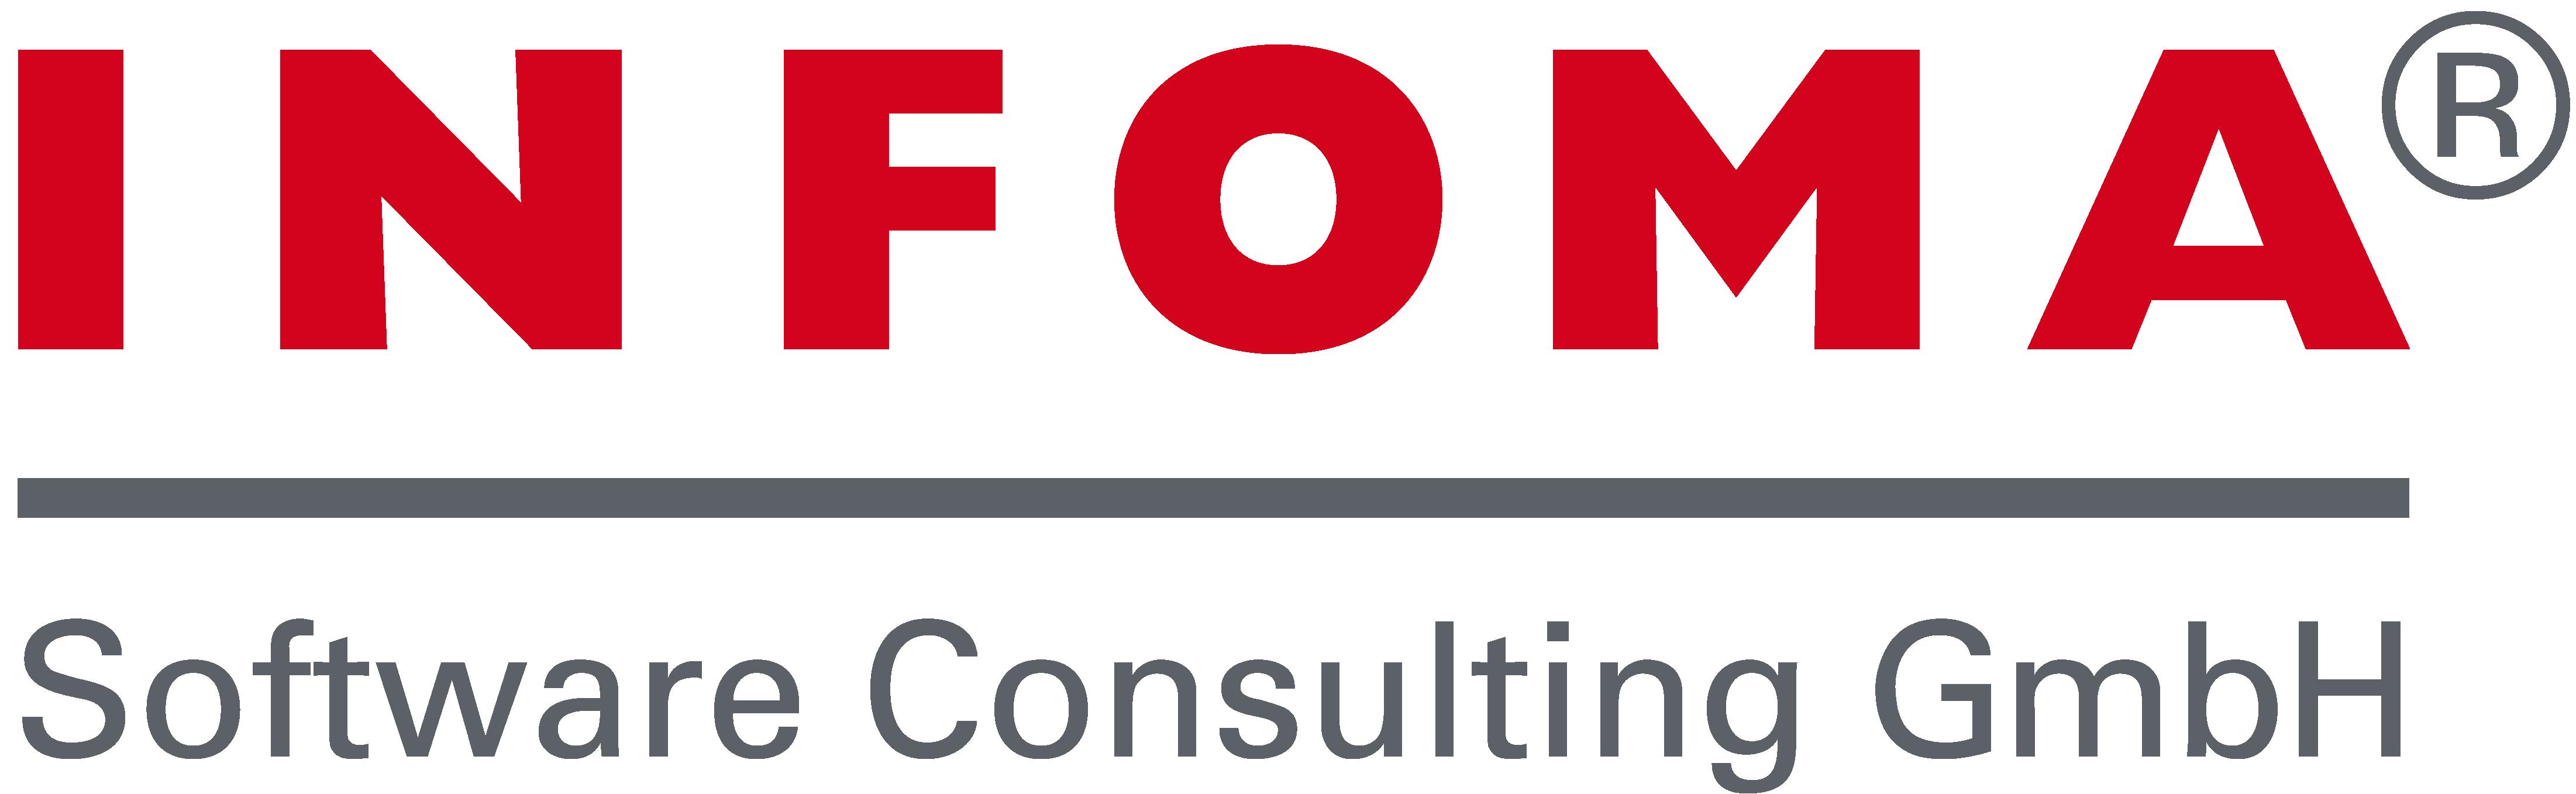 http://www.fum.de/webfm/fmhome.nsf/files/fmHomeLayout/$file/fum-logo.gif